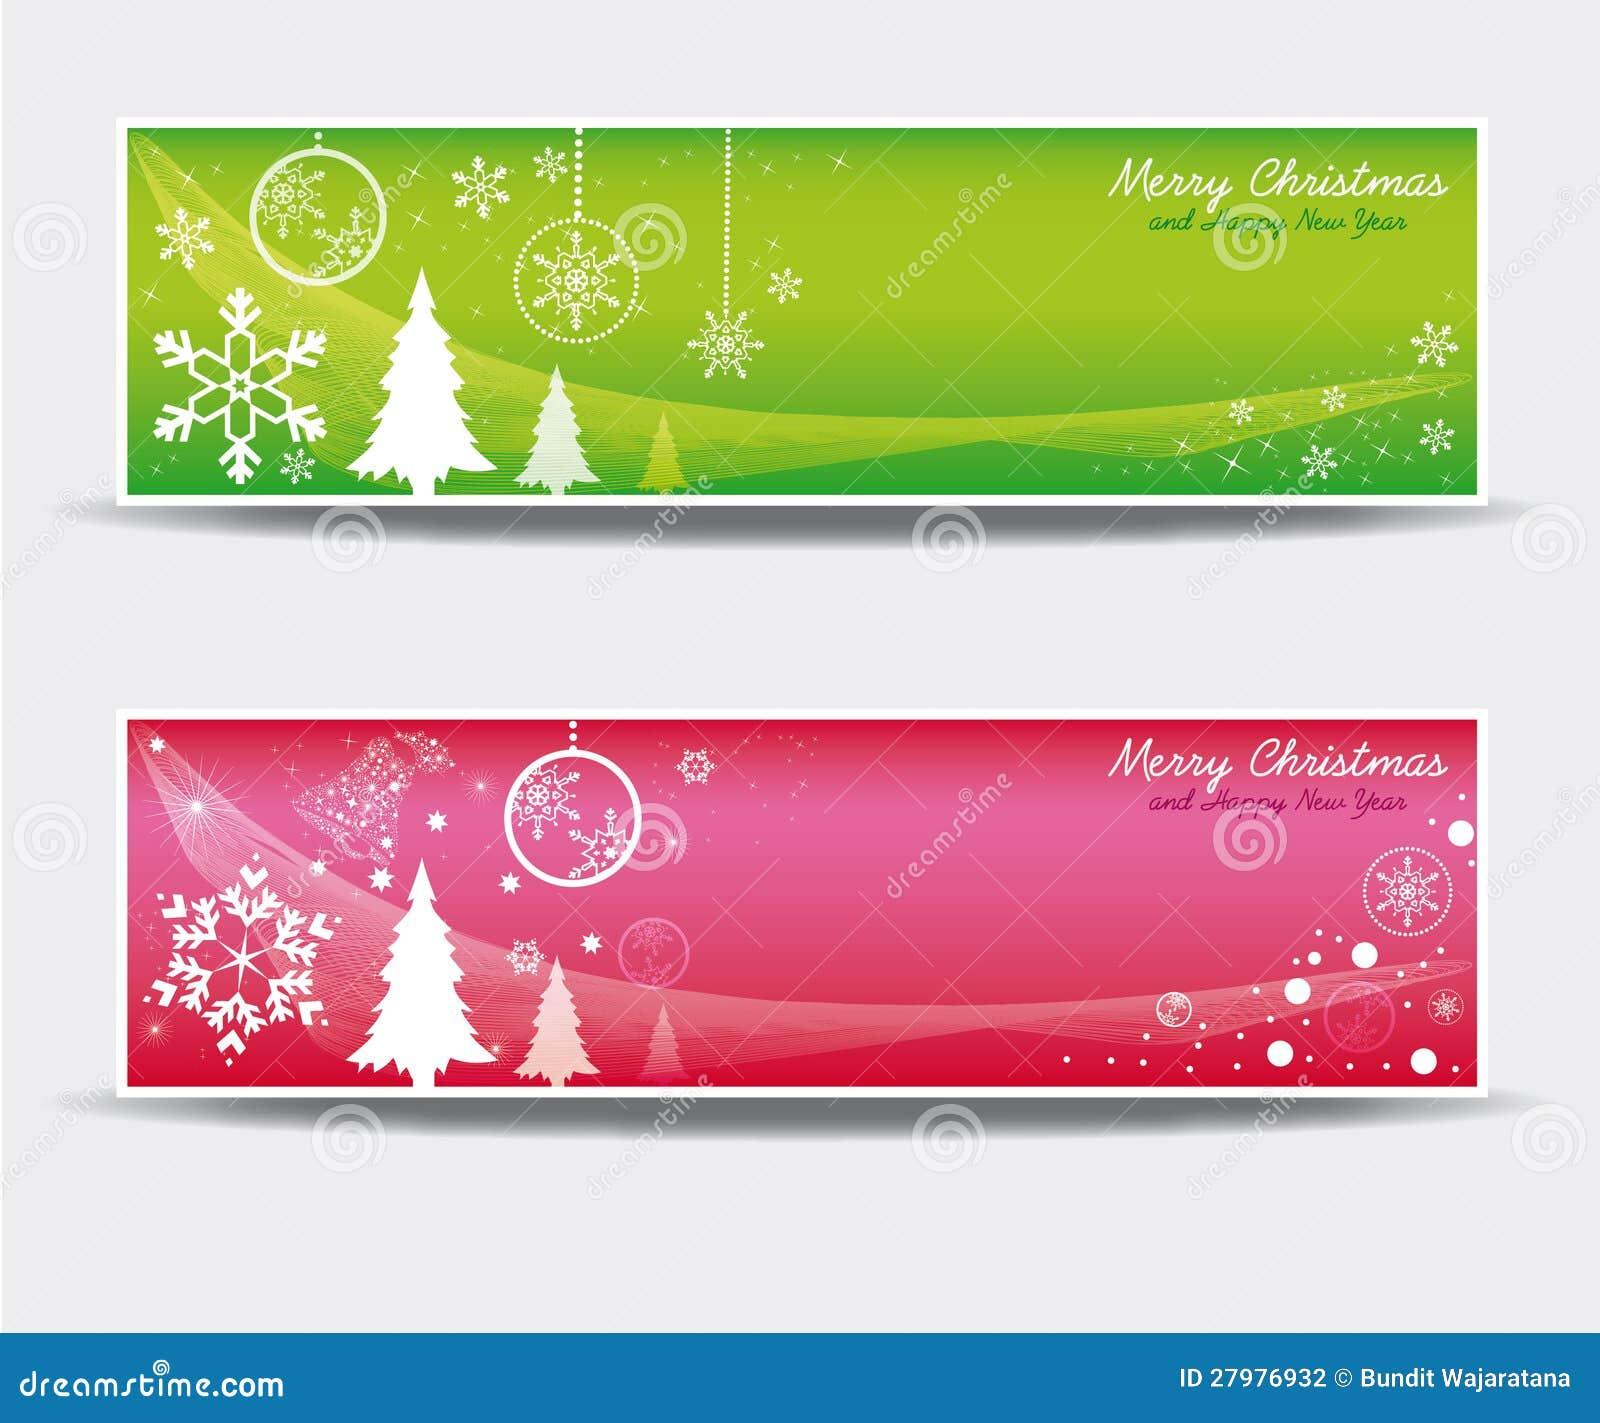 Christmas Voucher Template Elegant Christmas Gift Card Or Gift – Christmas Gift Vouchers Templates